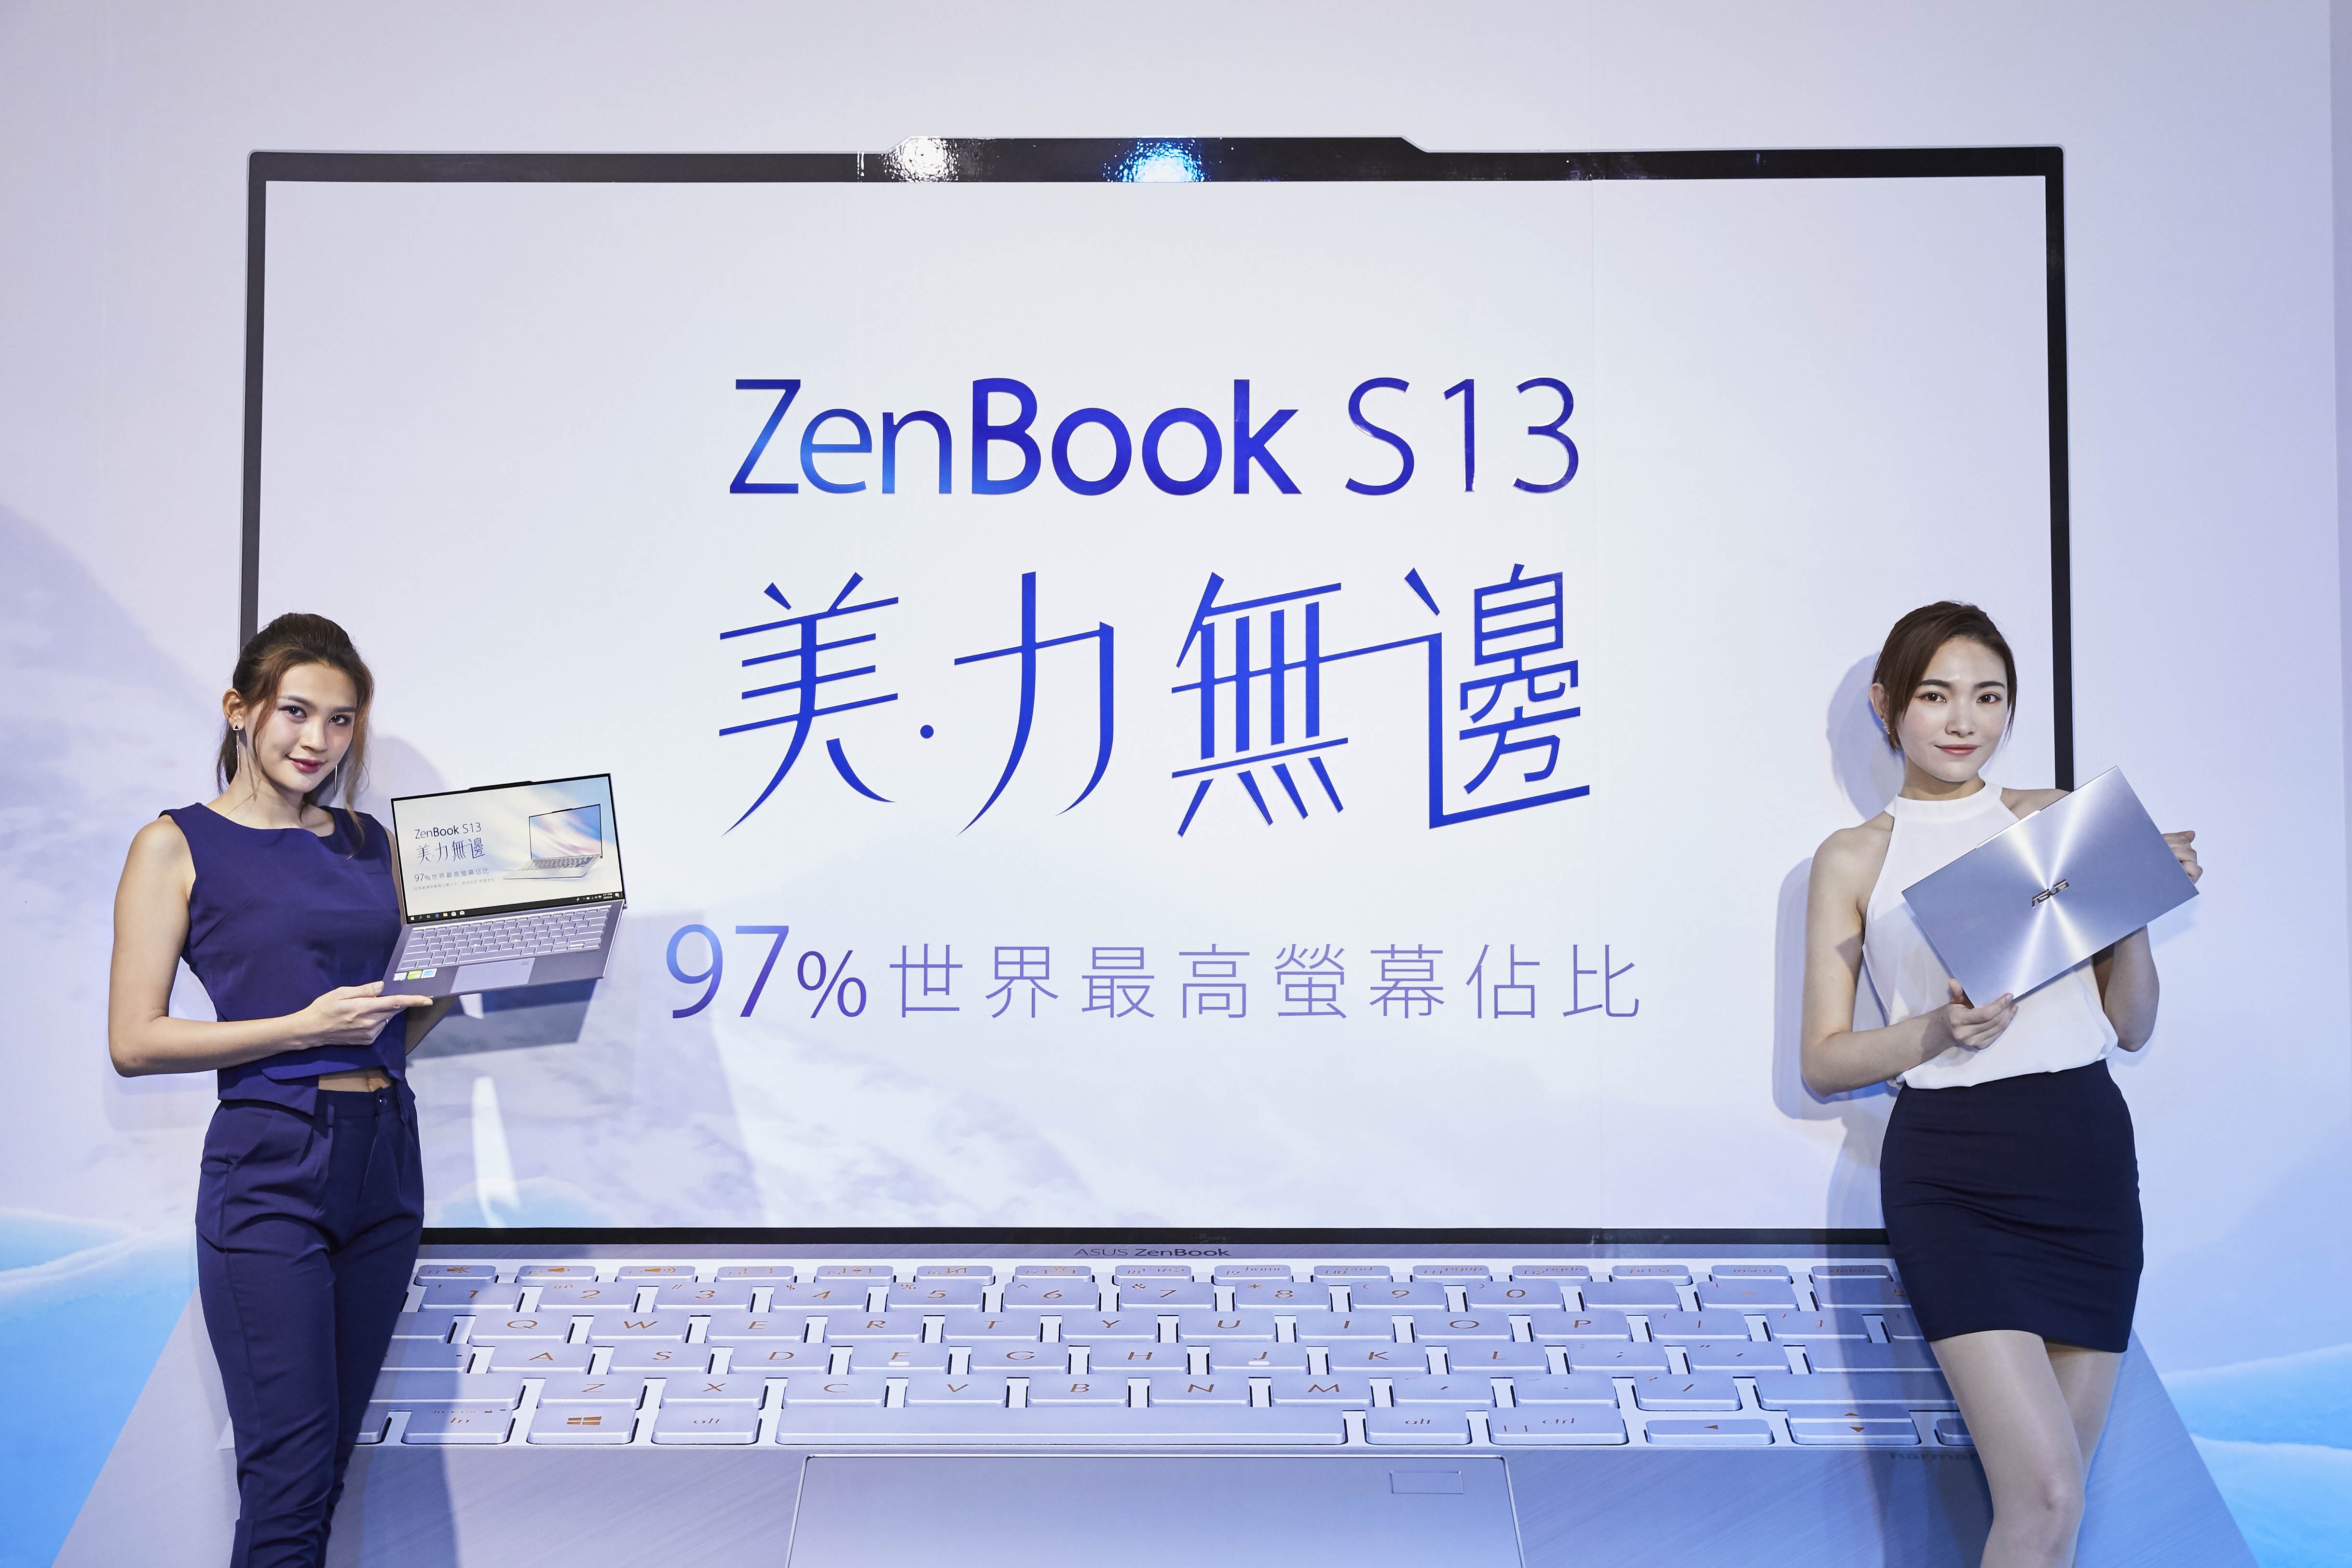 ASUS ZenBook S13僅12.9mm、1.1kg,讓使用者攜帶輕鬆便利。